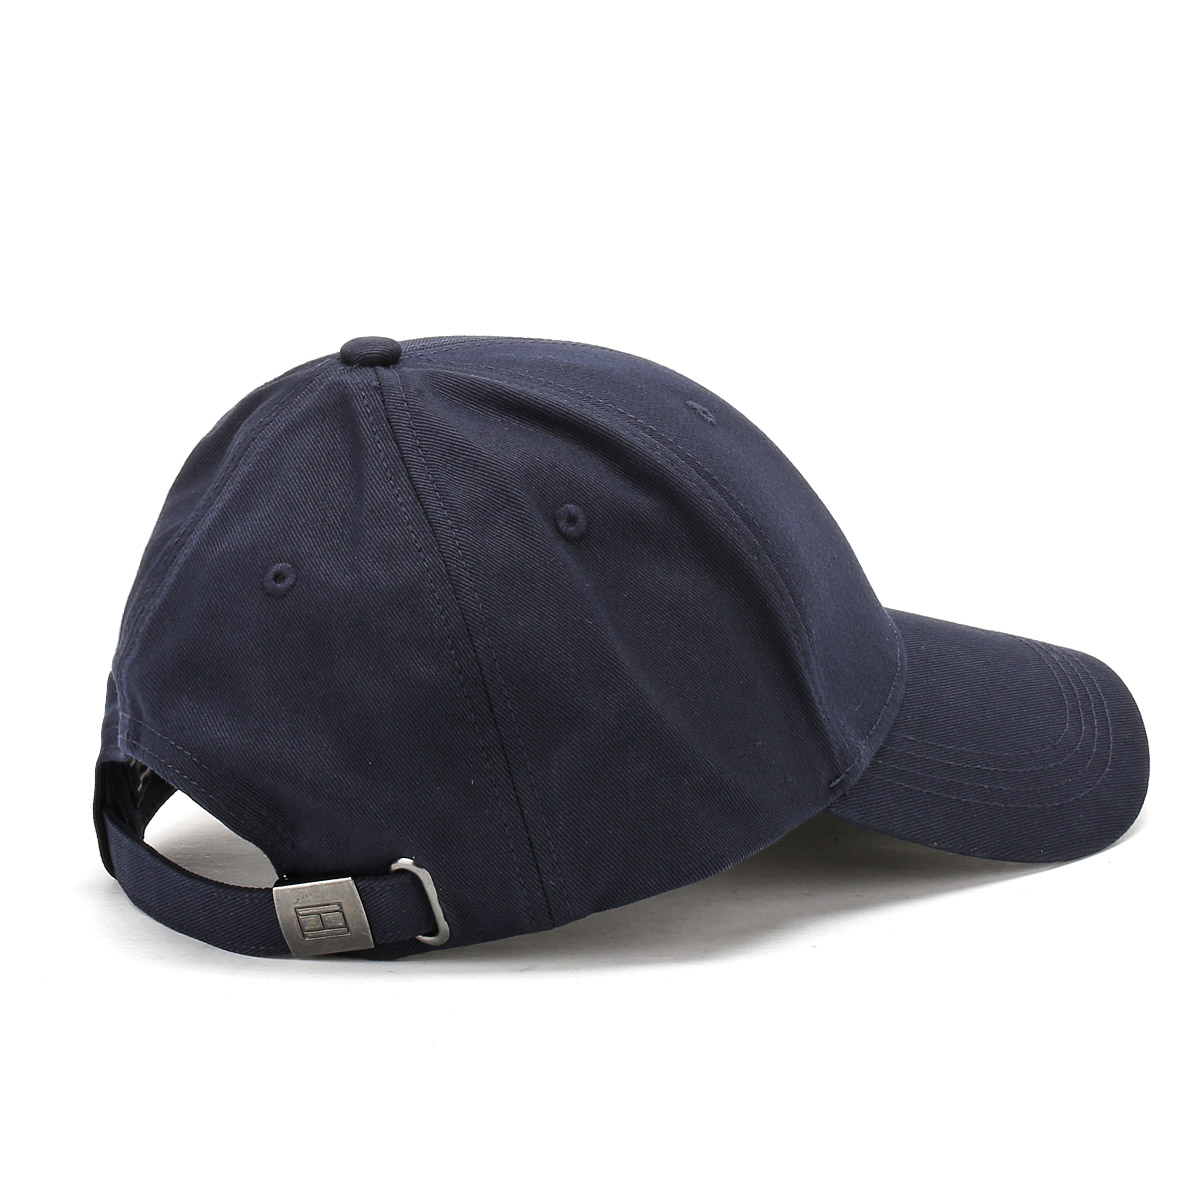 f1c731866 Tommy Hilfiger Womens Midnight Black Classic Baseball Cap, Ladies Hat. Buy  Now Price